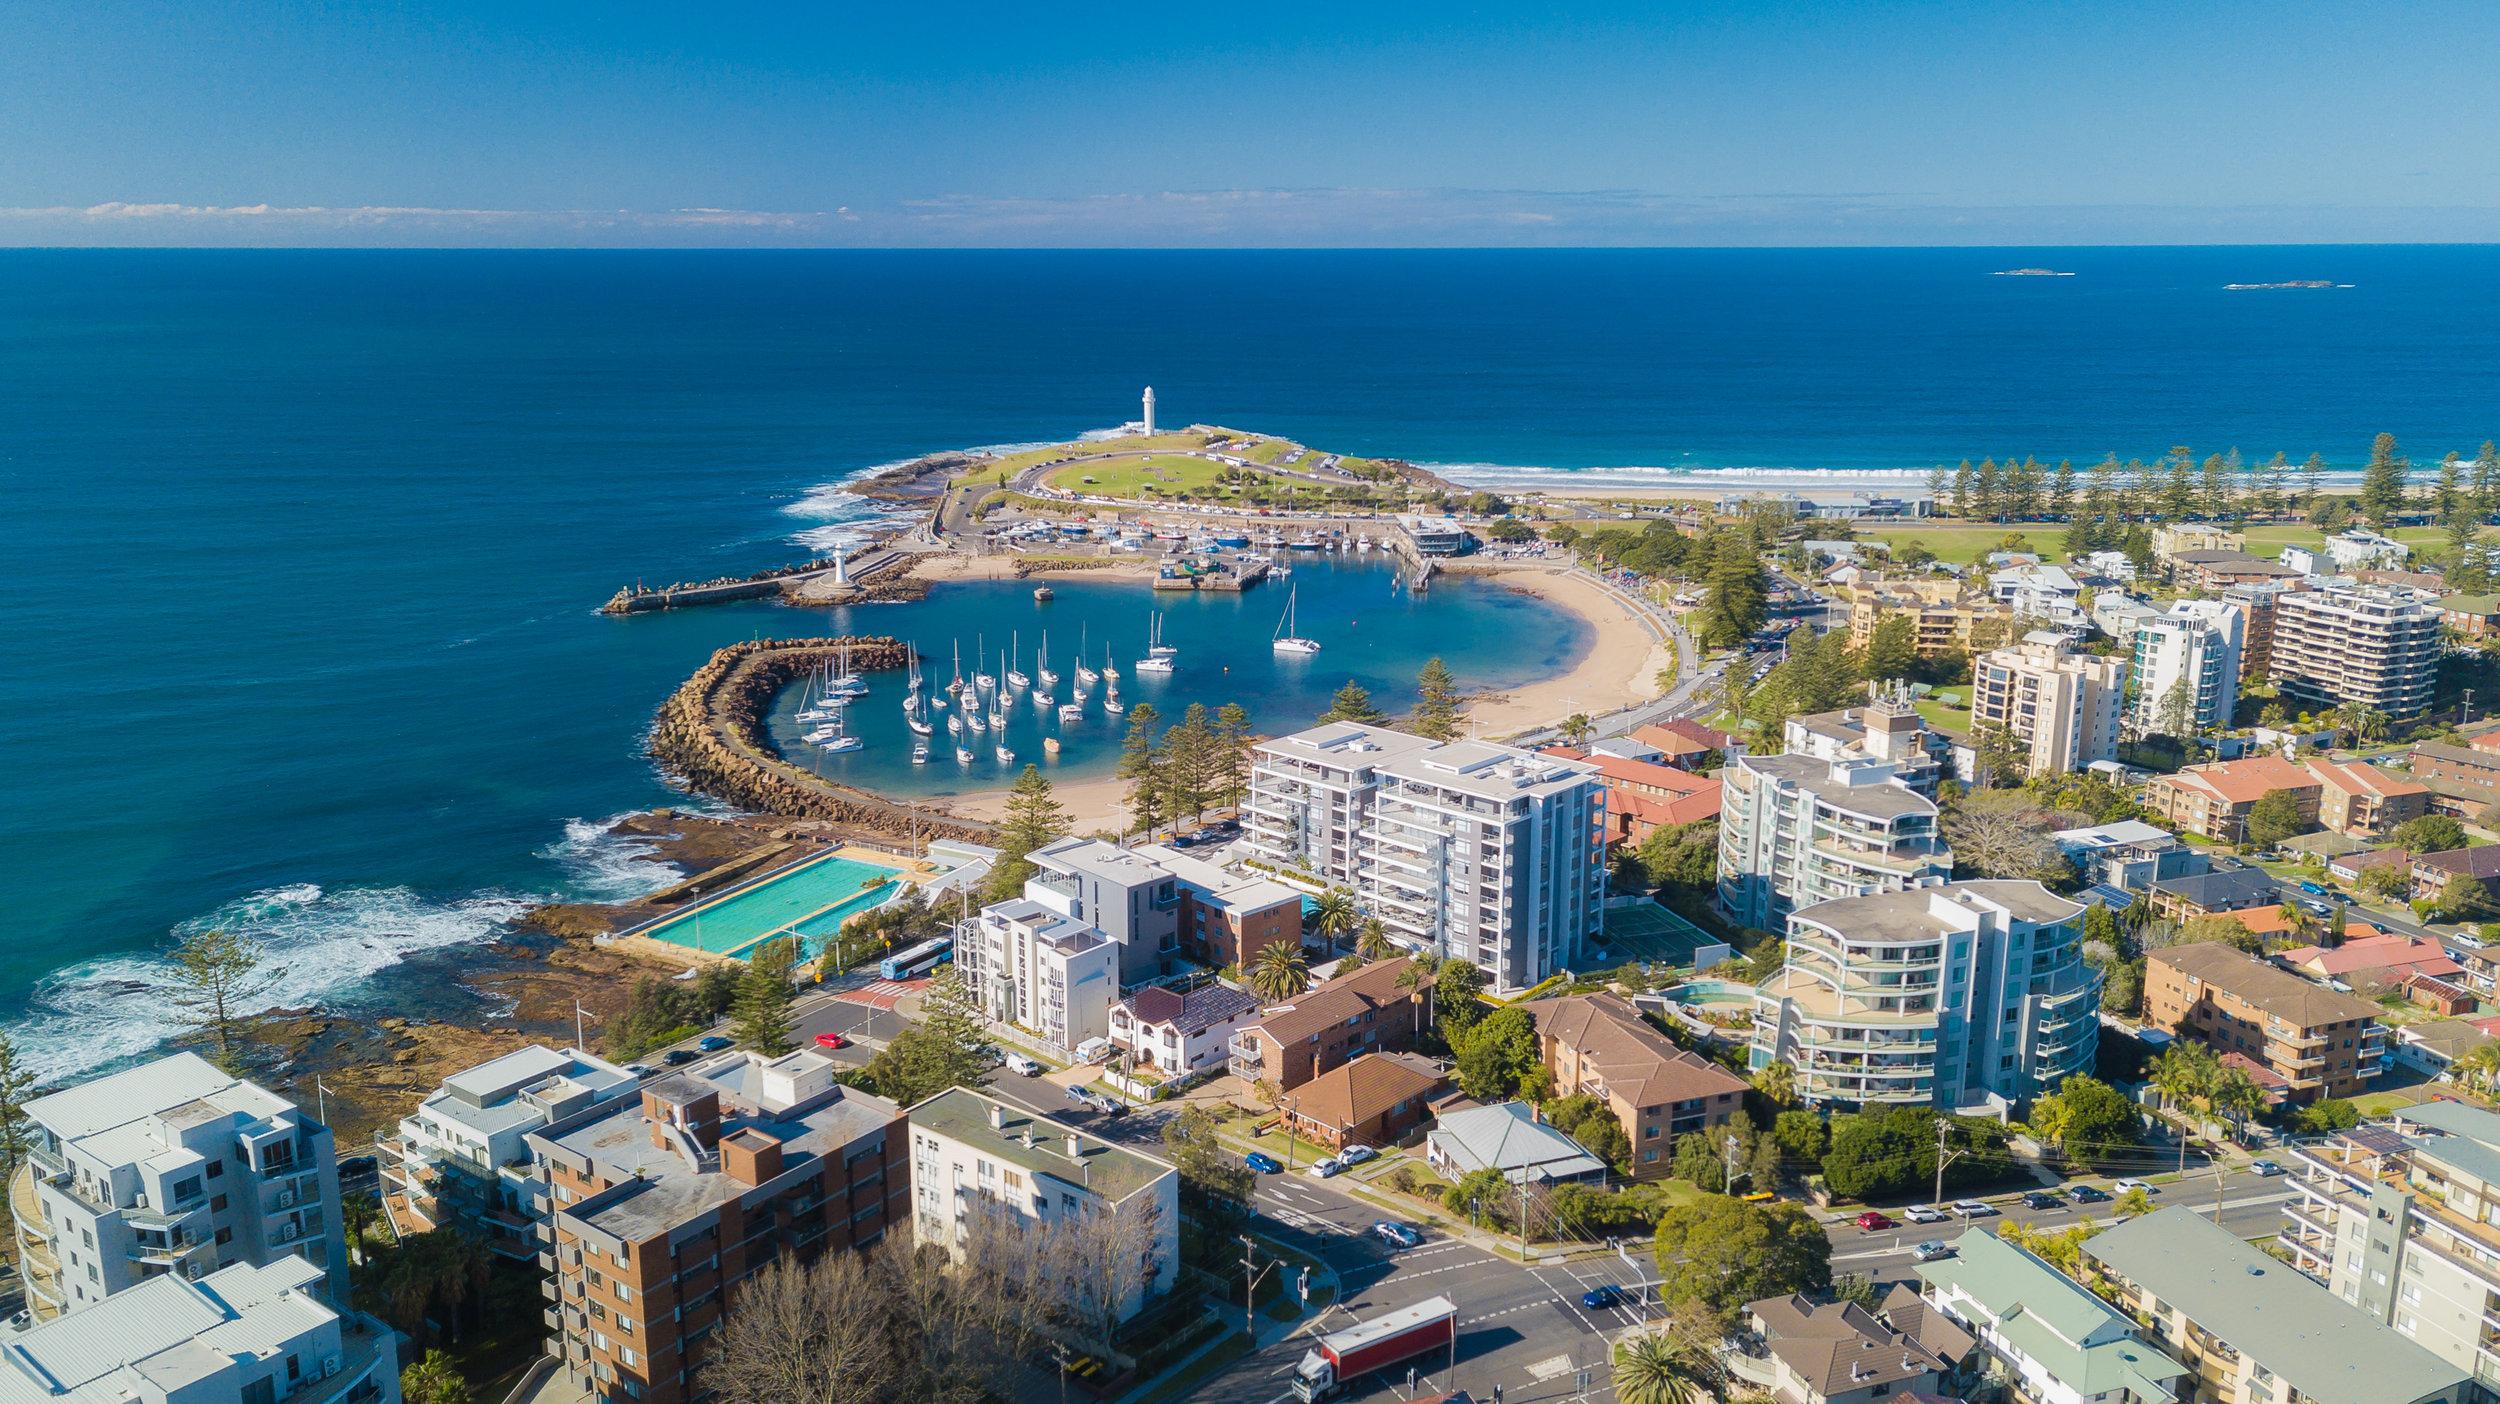 Copy of Kiama Shellharbour Gerringong Berry Wollongong South Coast Illawarra Drone Photographer13.jpg